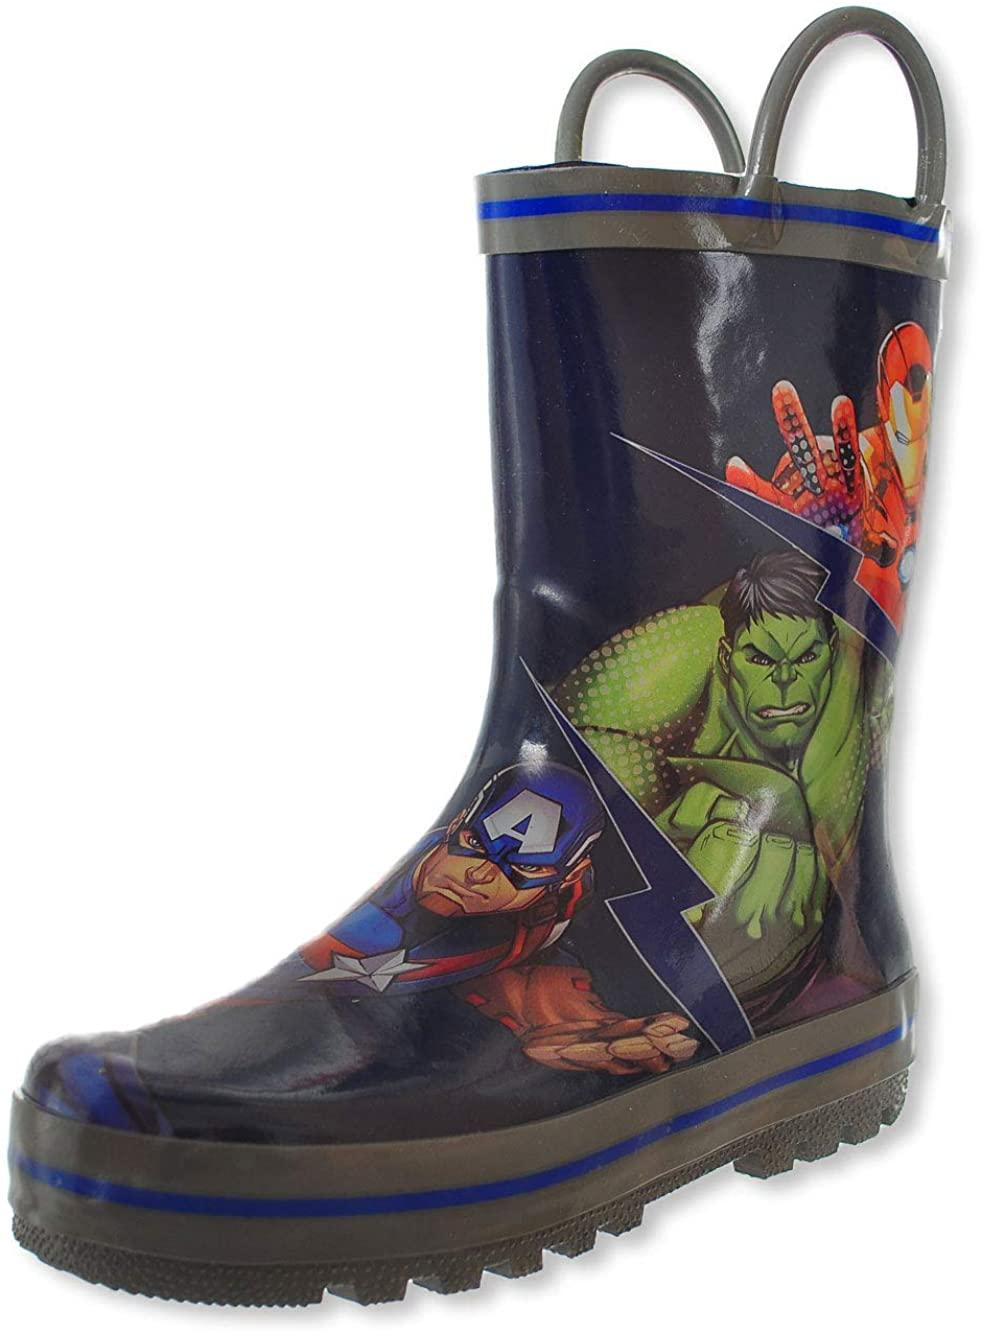 Favorite Characters Avengers Rain Boot (Toddler/Little Kid)